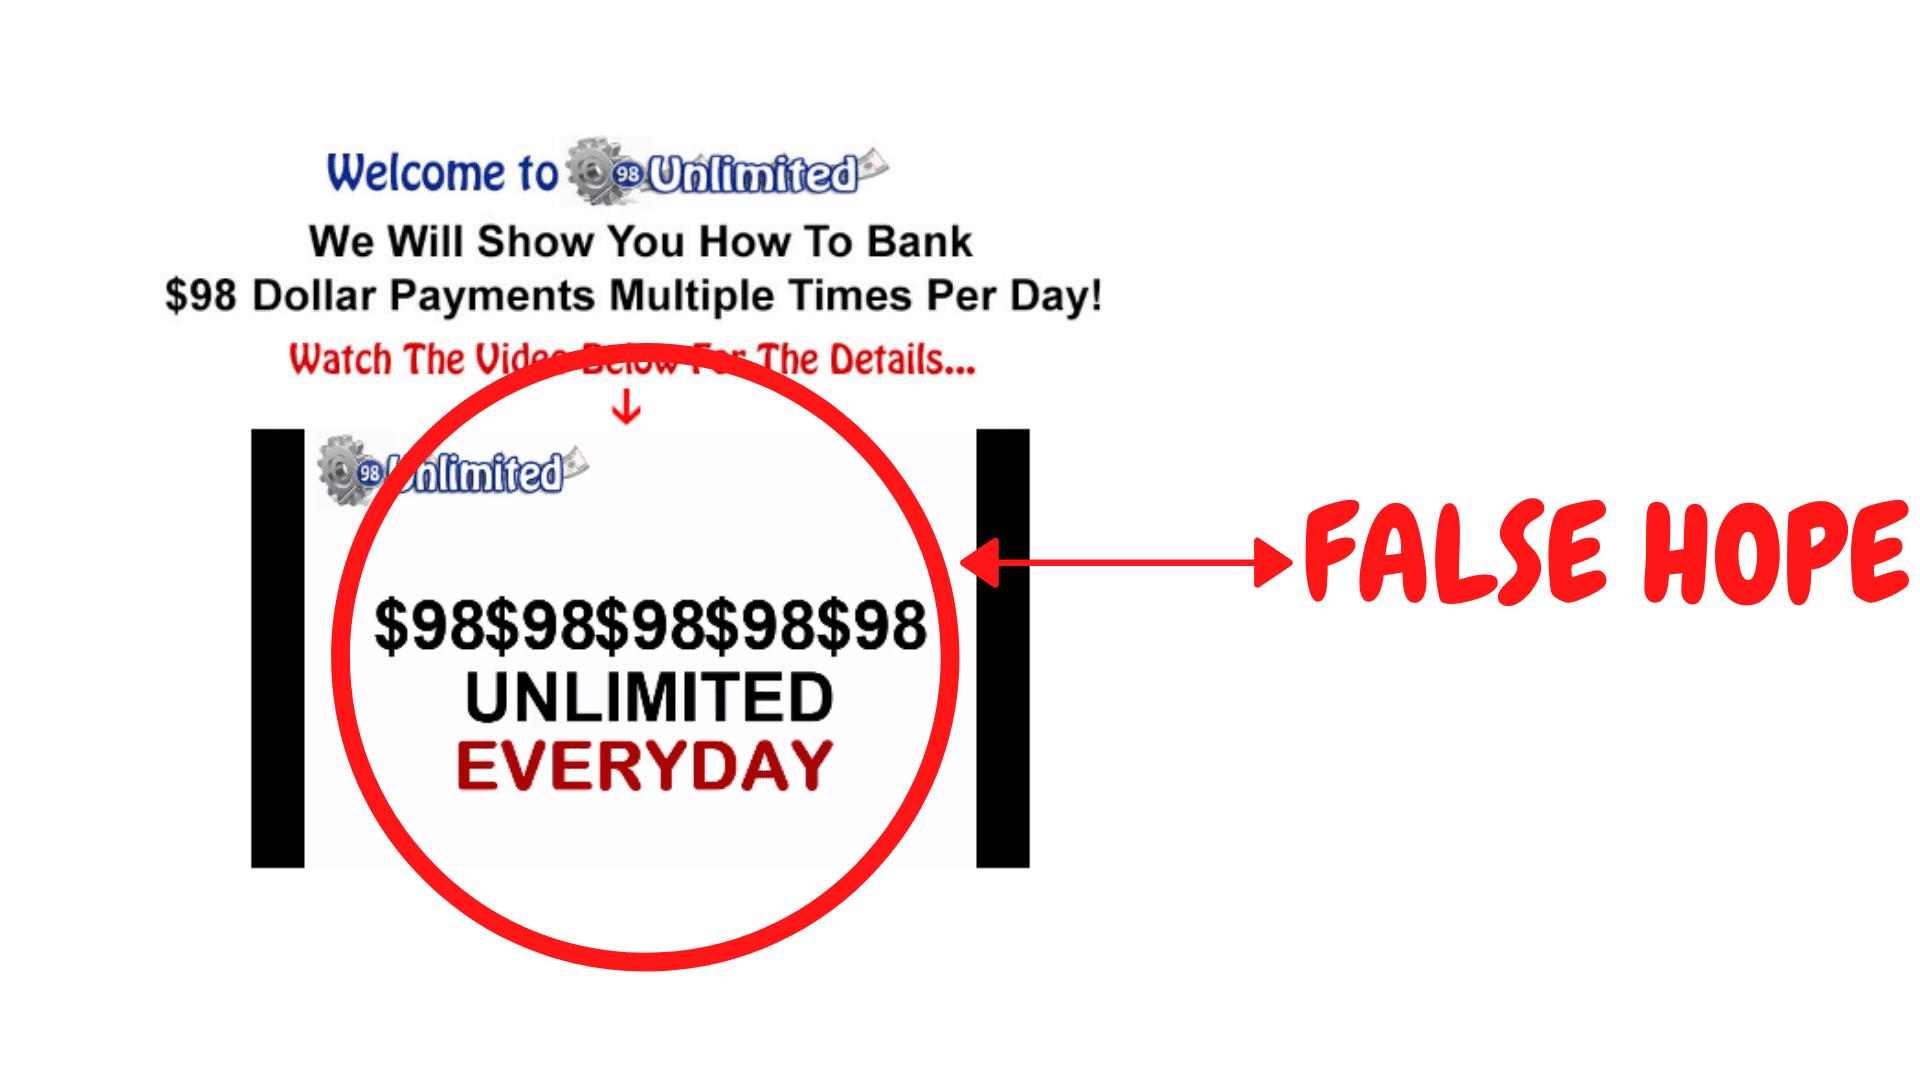 98 Unlimited False Hope